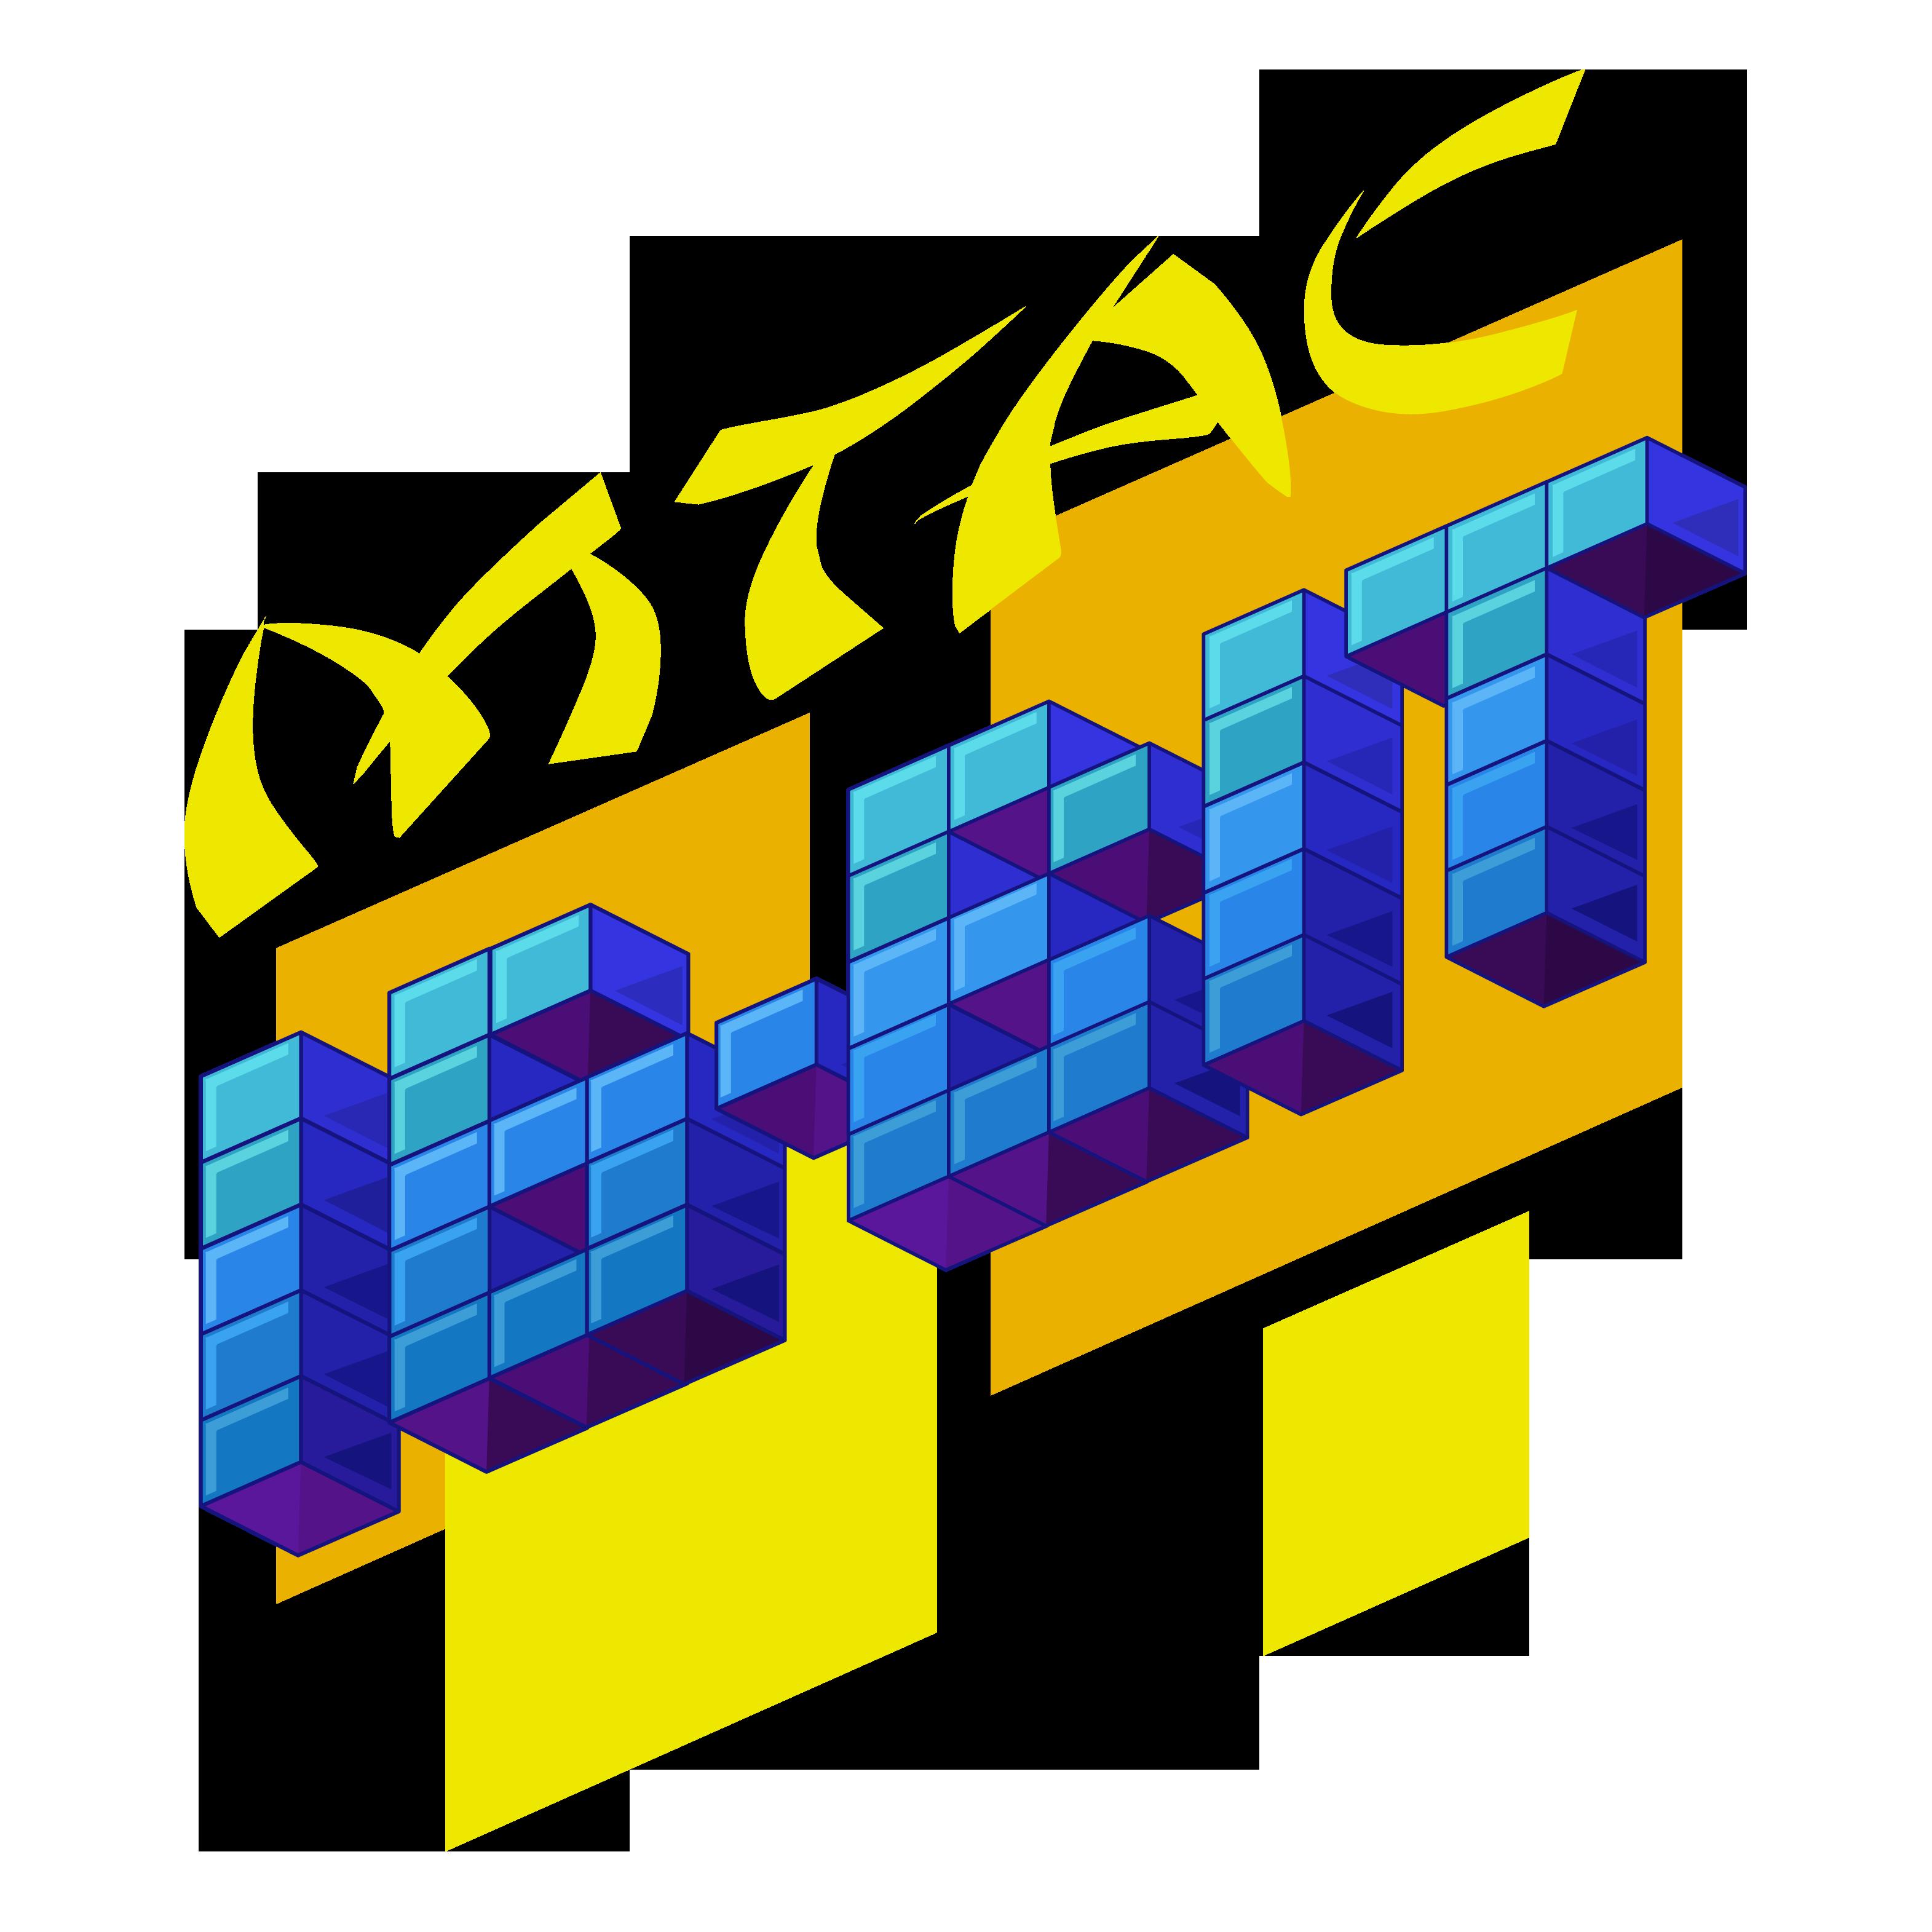 MTAC 16-Bit Logo • Hello! I'm Jessica Cantlope